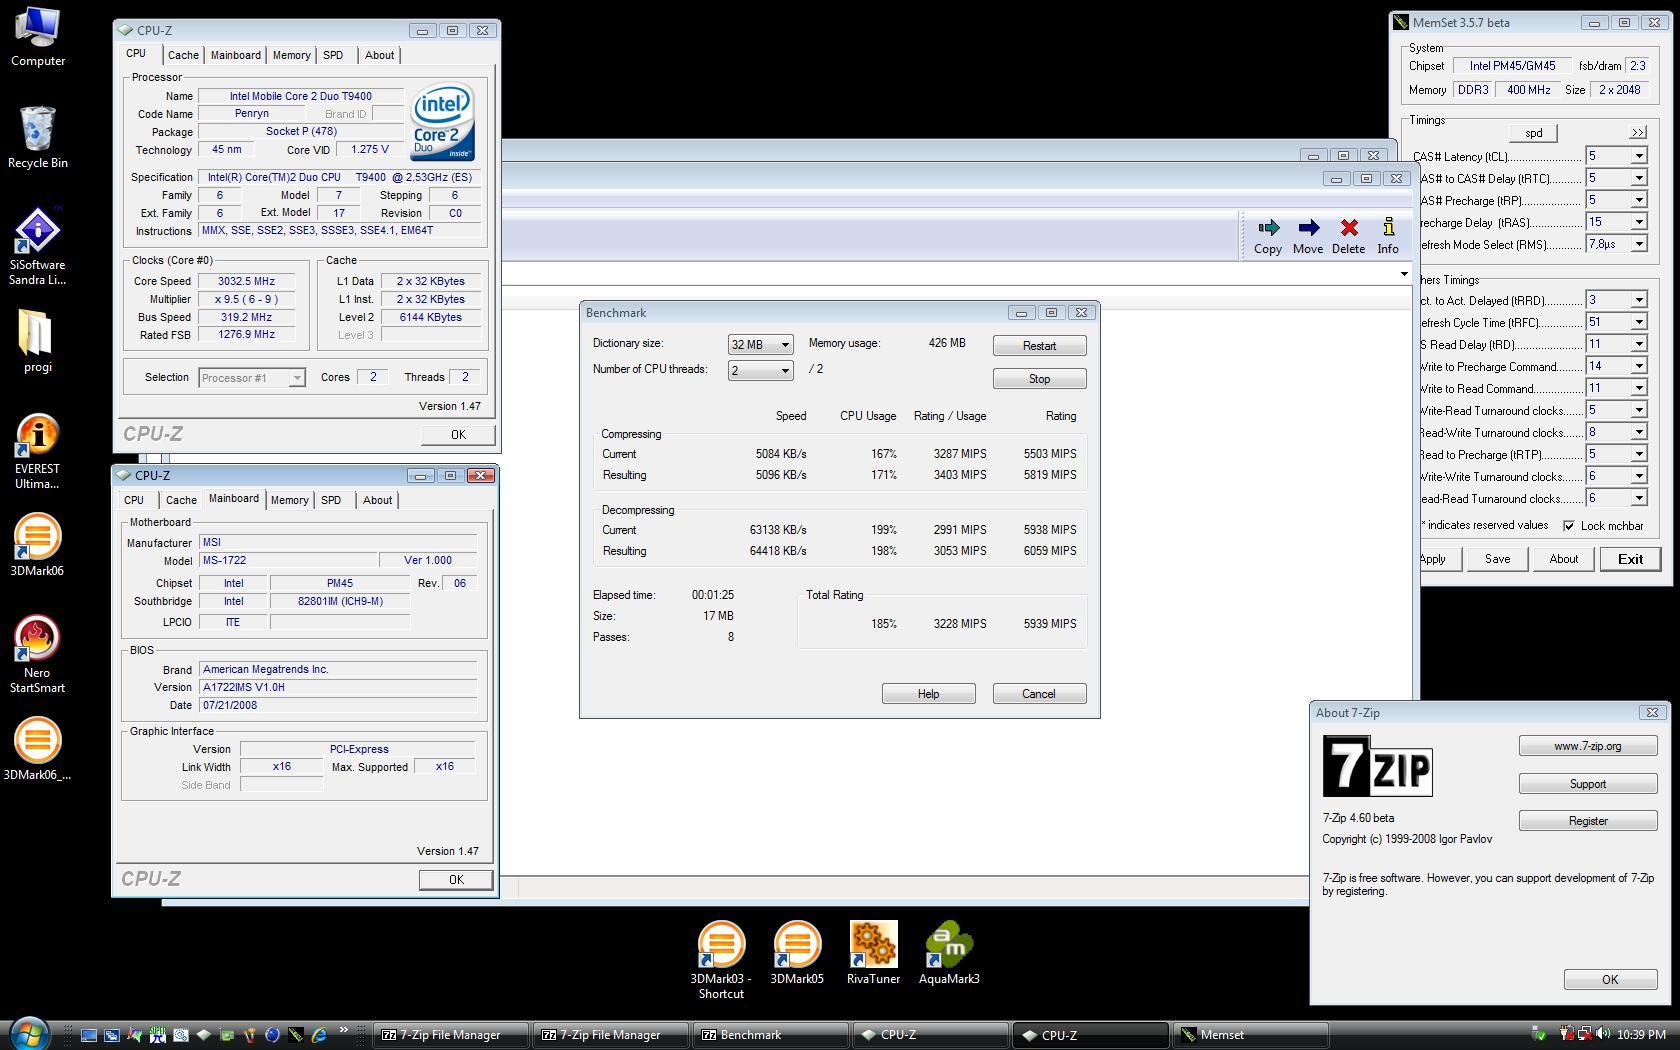 Winrar Архиватор Для Андроид Скачать